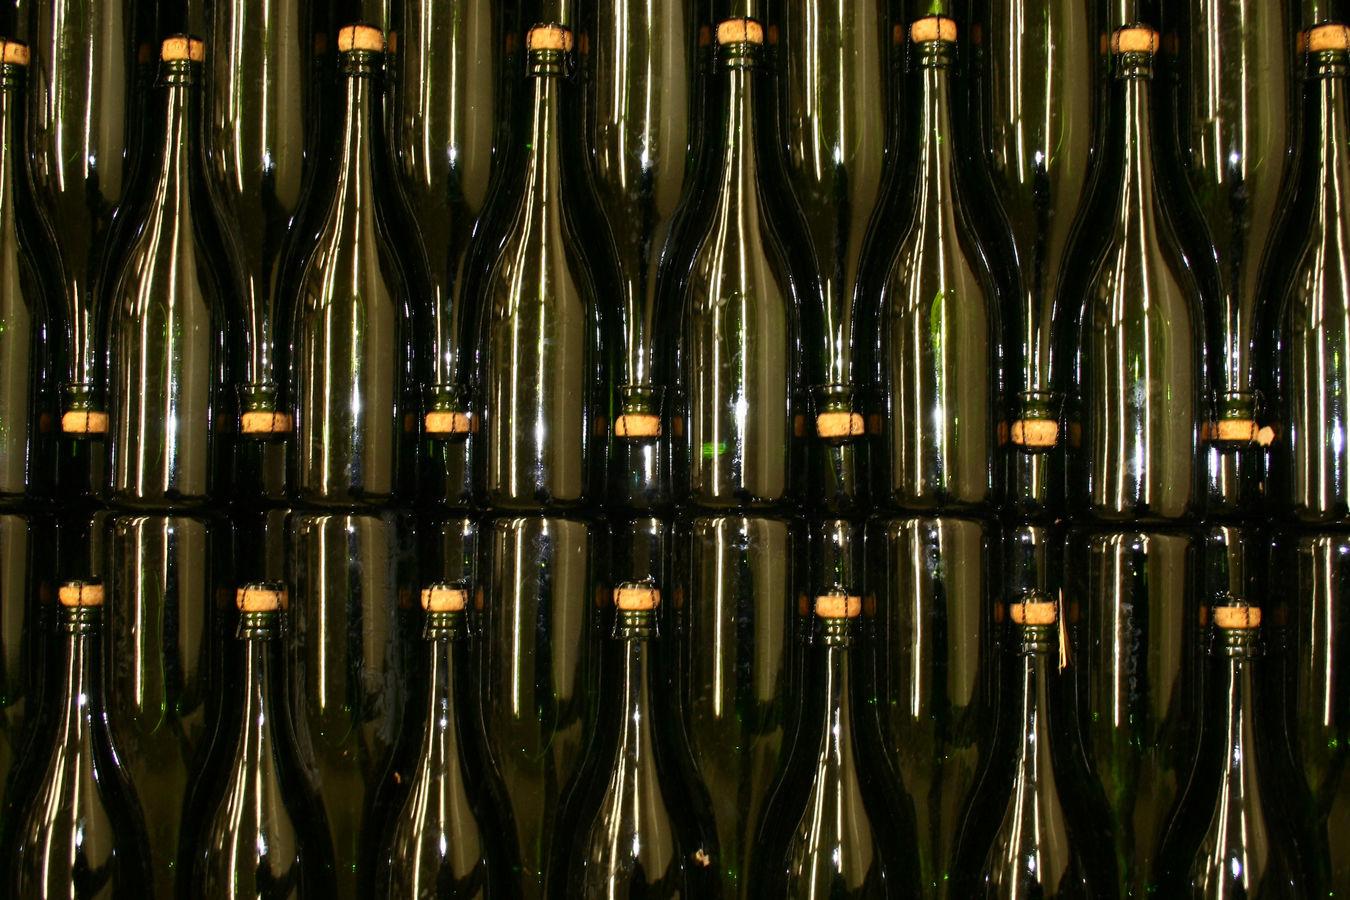 1012 argyle winery brut bottles 041 nml9zl